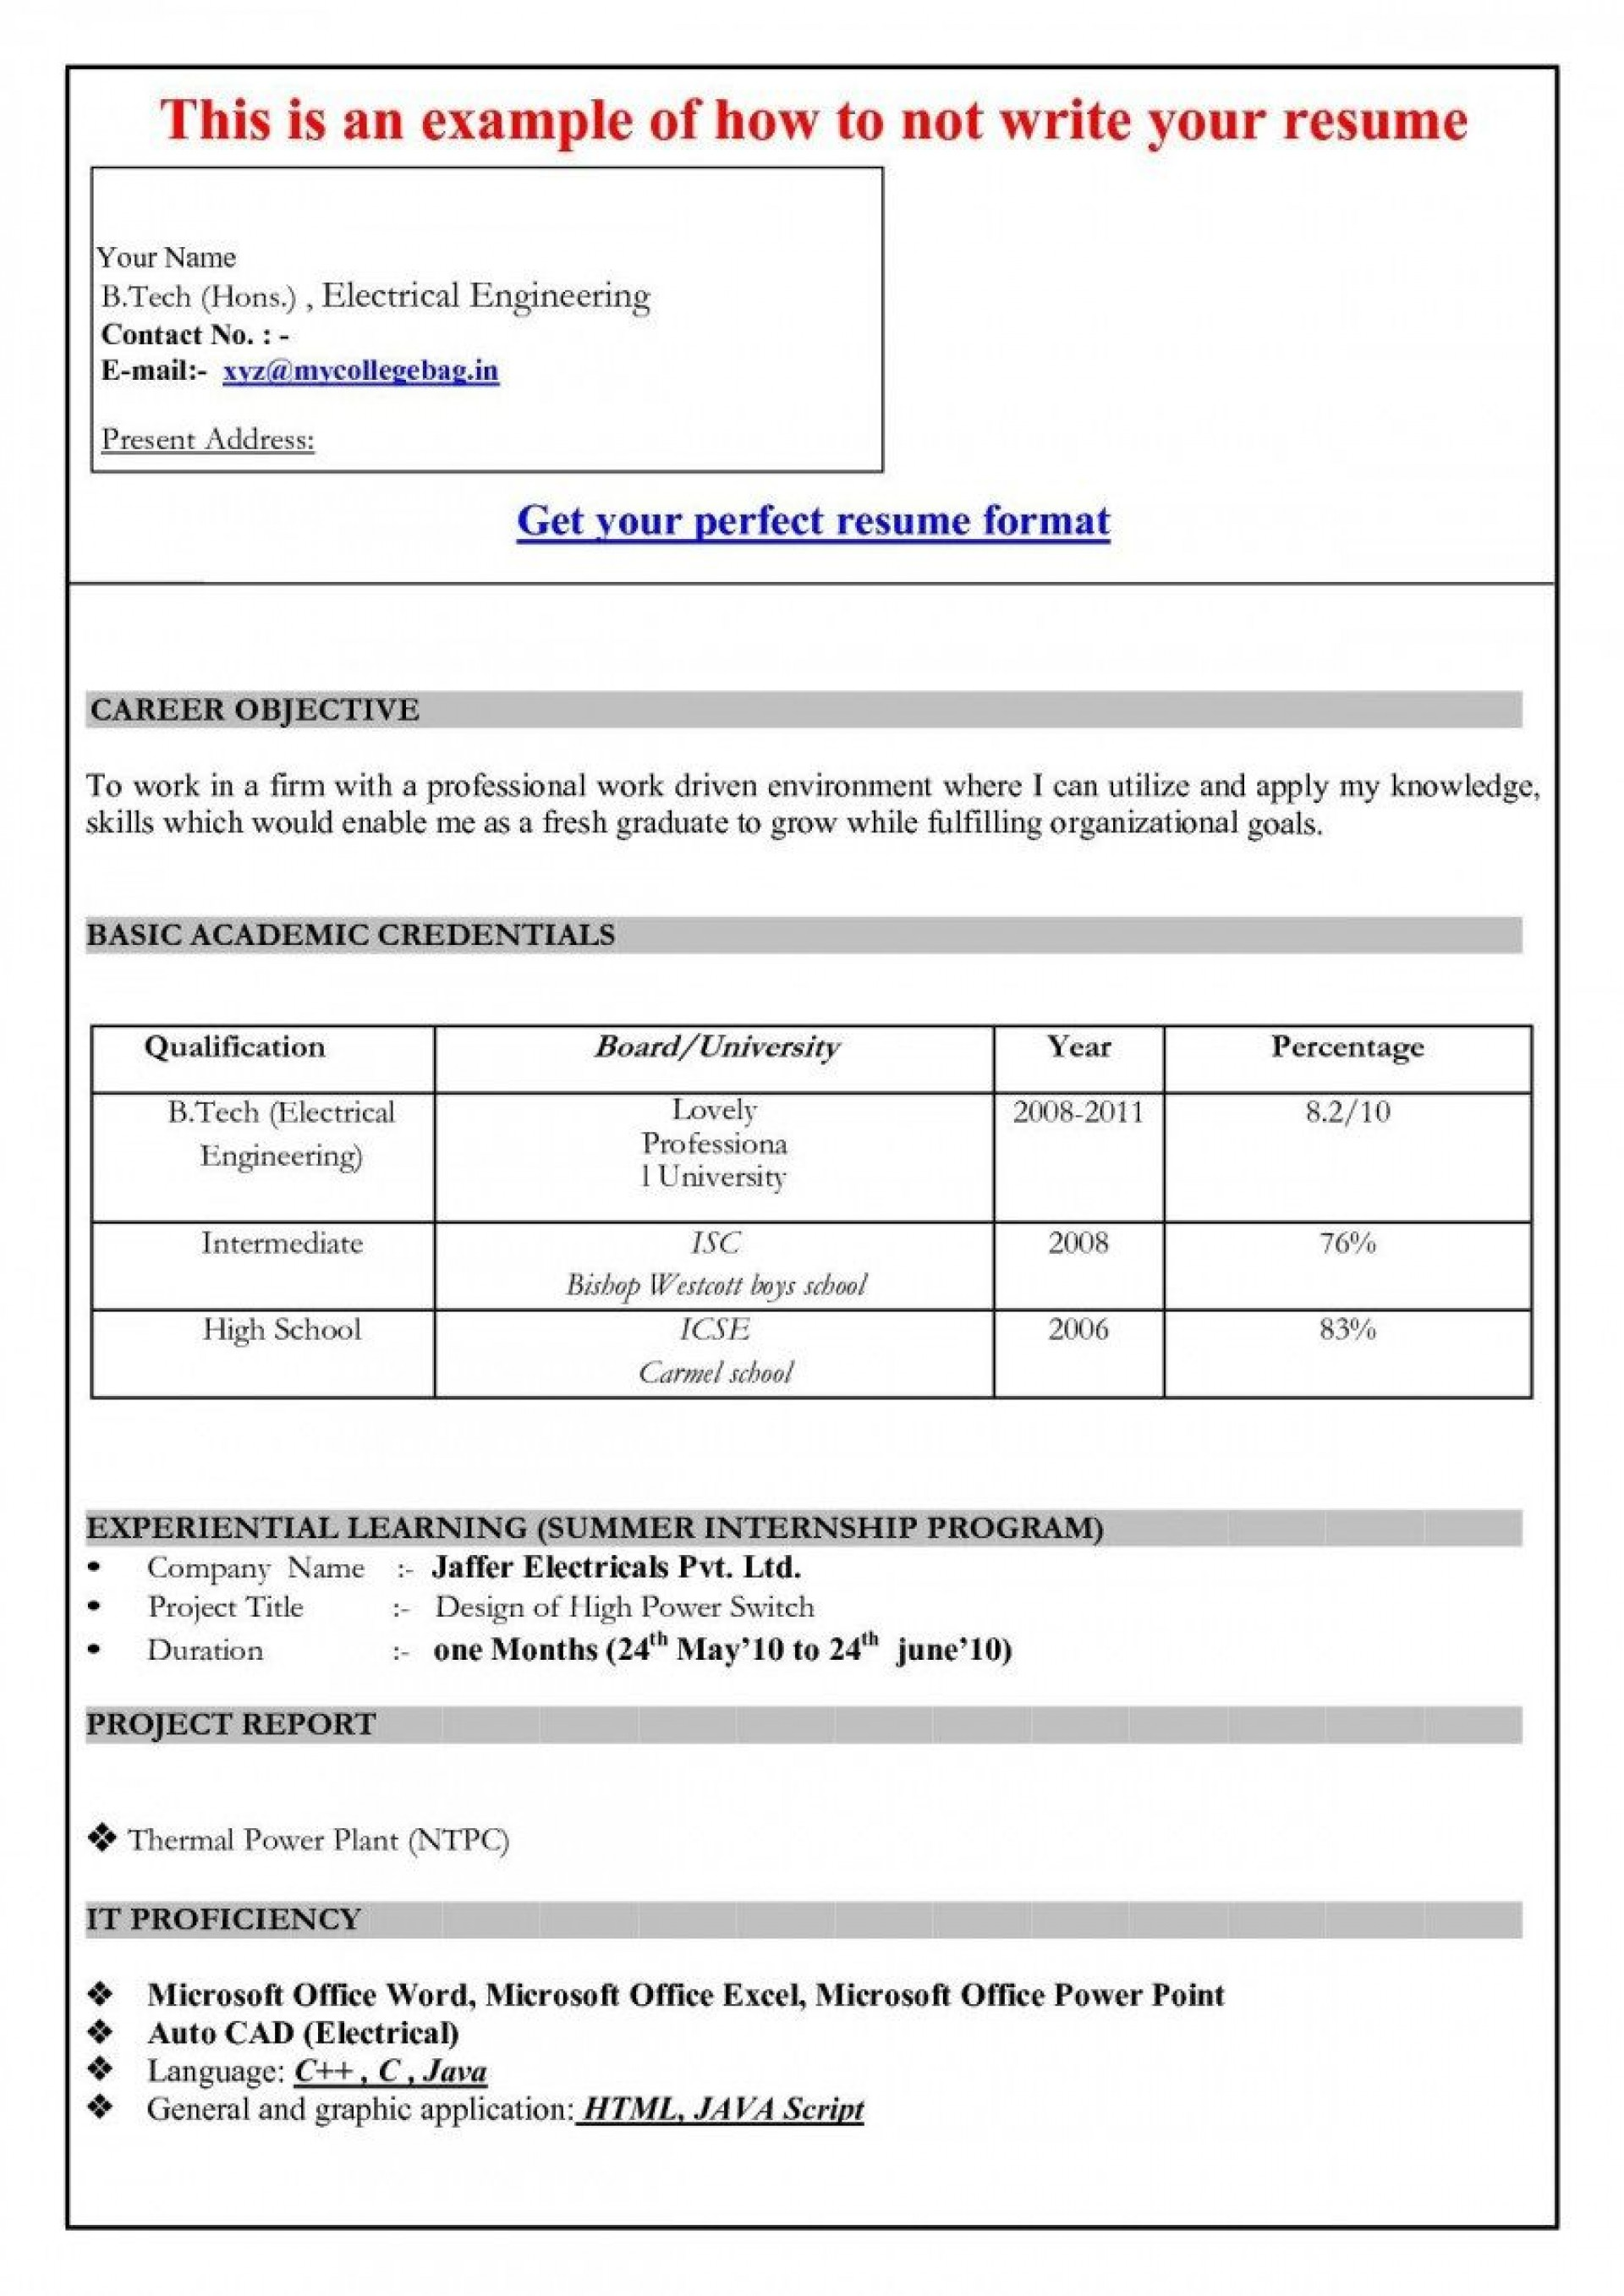 009 Formidable Teacher Resume Template Microsoft Word 2007 Image 1920